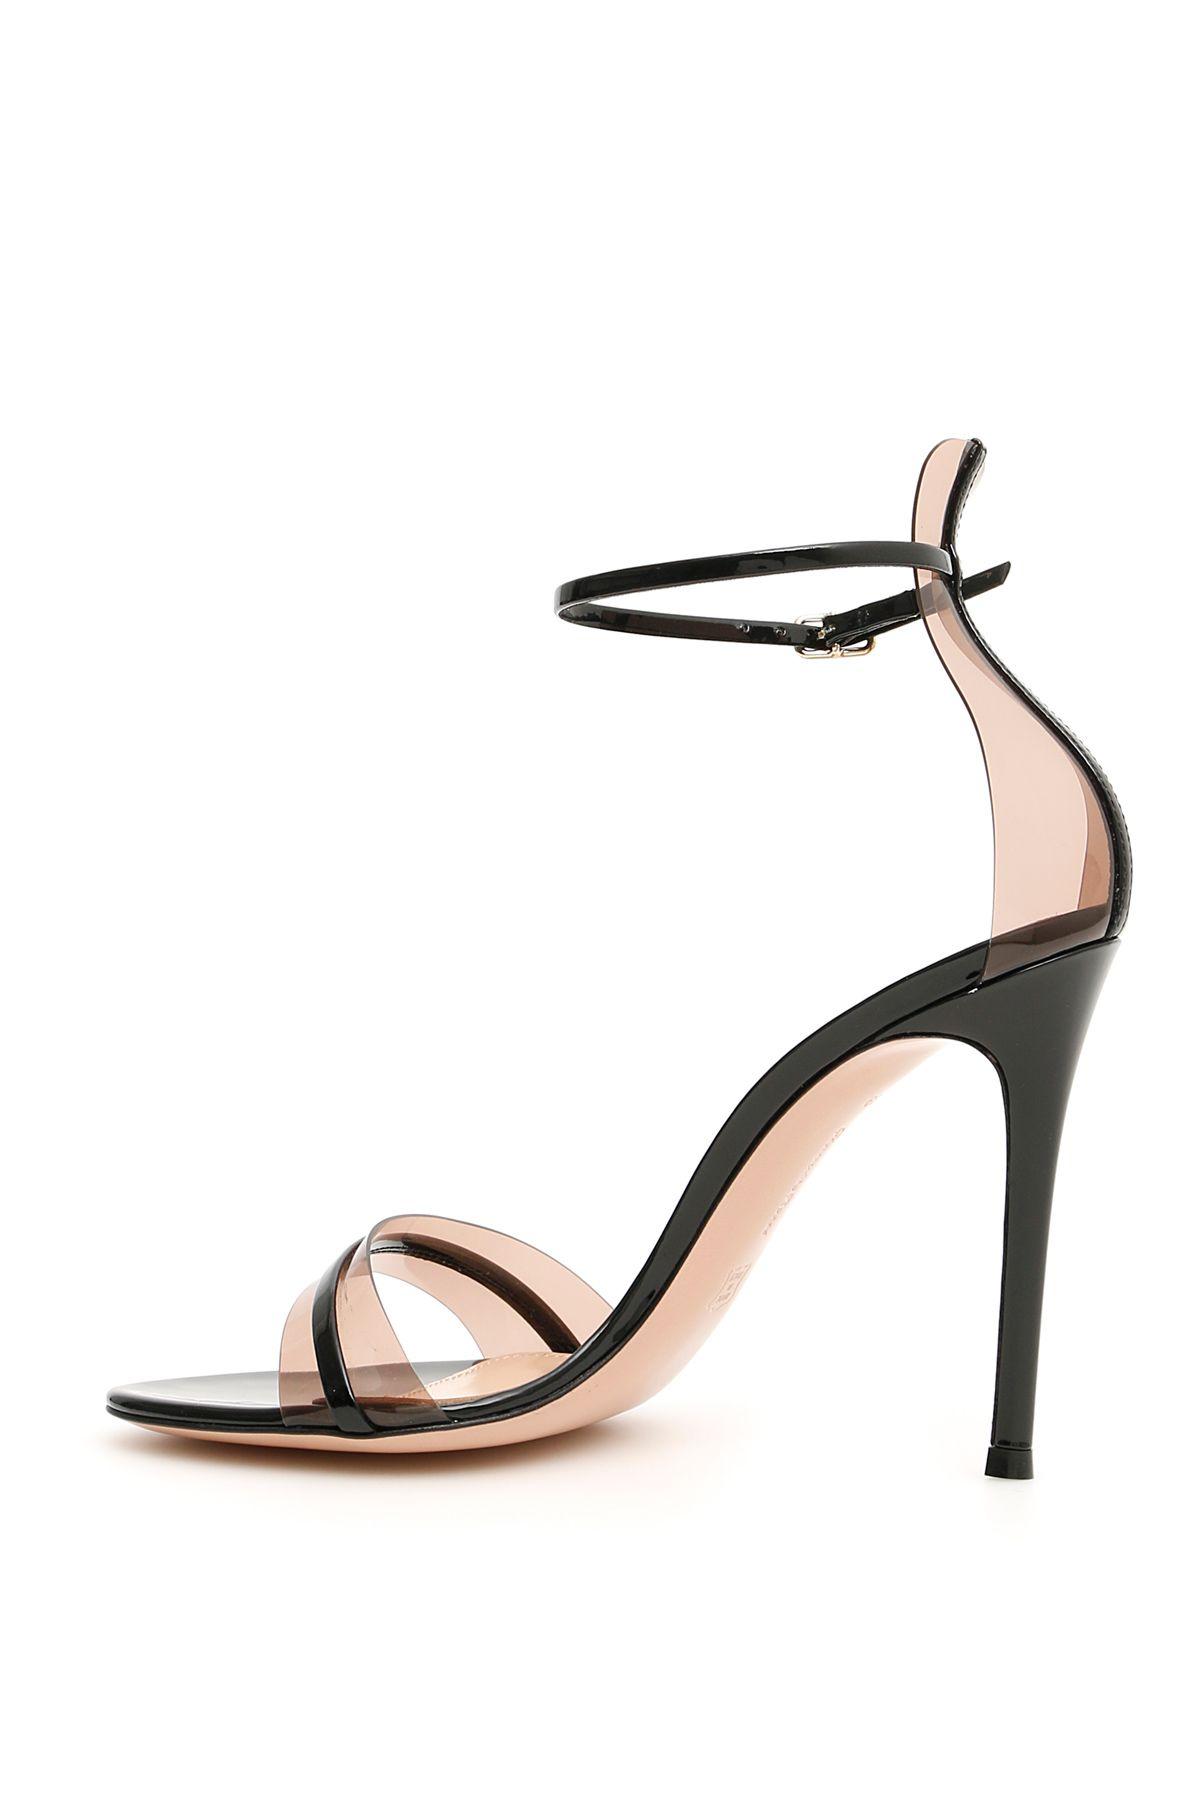 1c5df5daf Gianvito Rossi Gianvito Rossi G String 105 Sandals - BLACK BLUSH ...